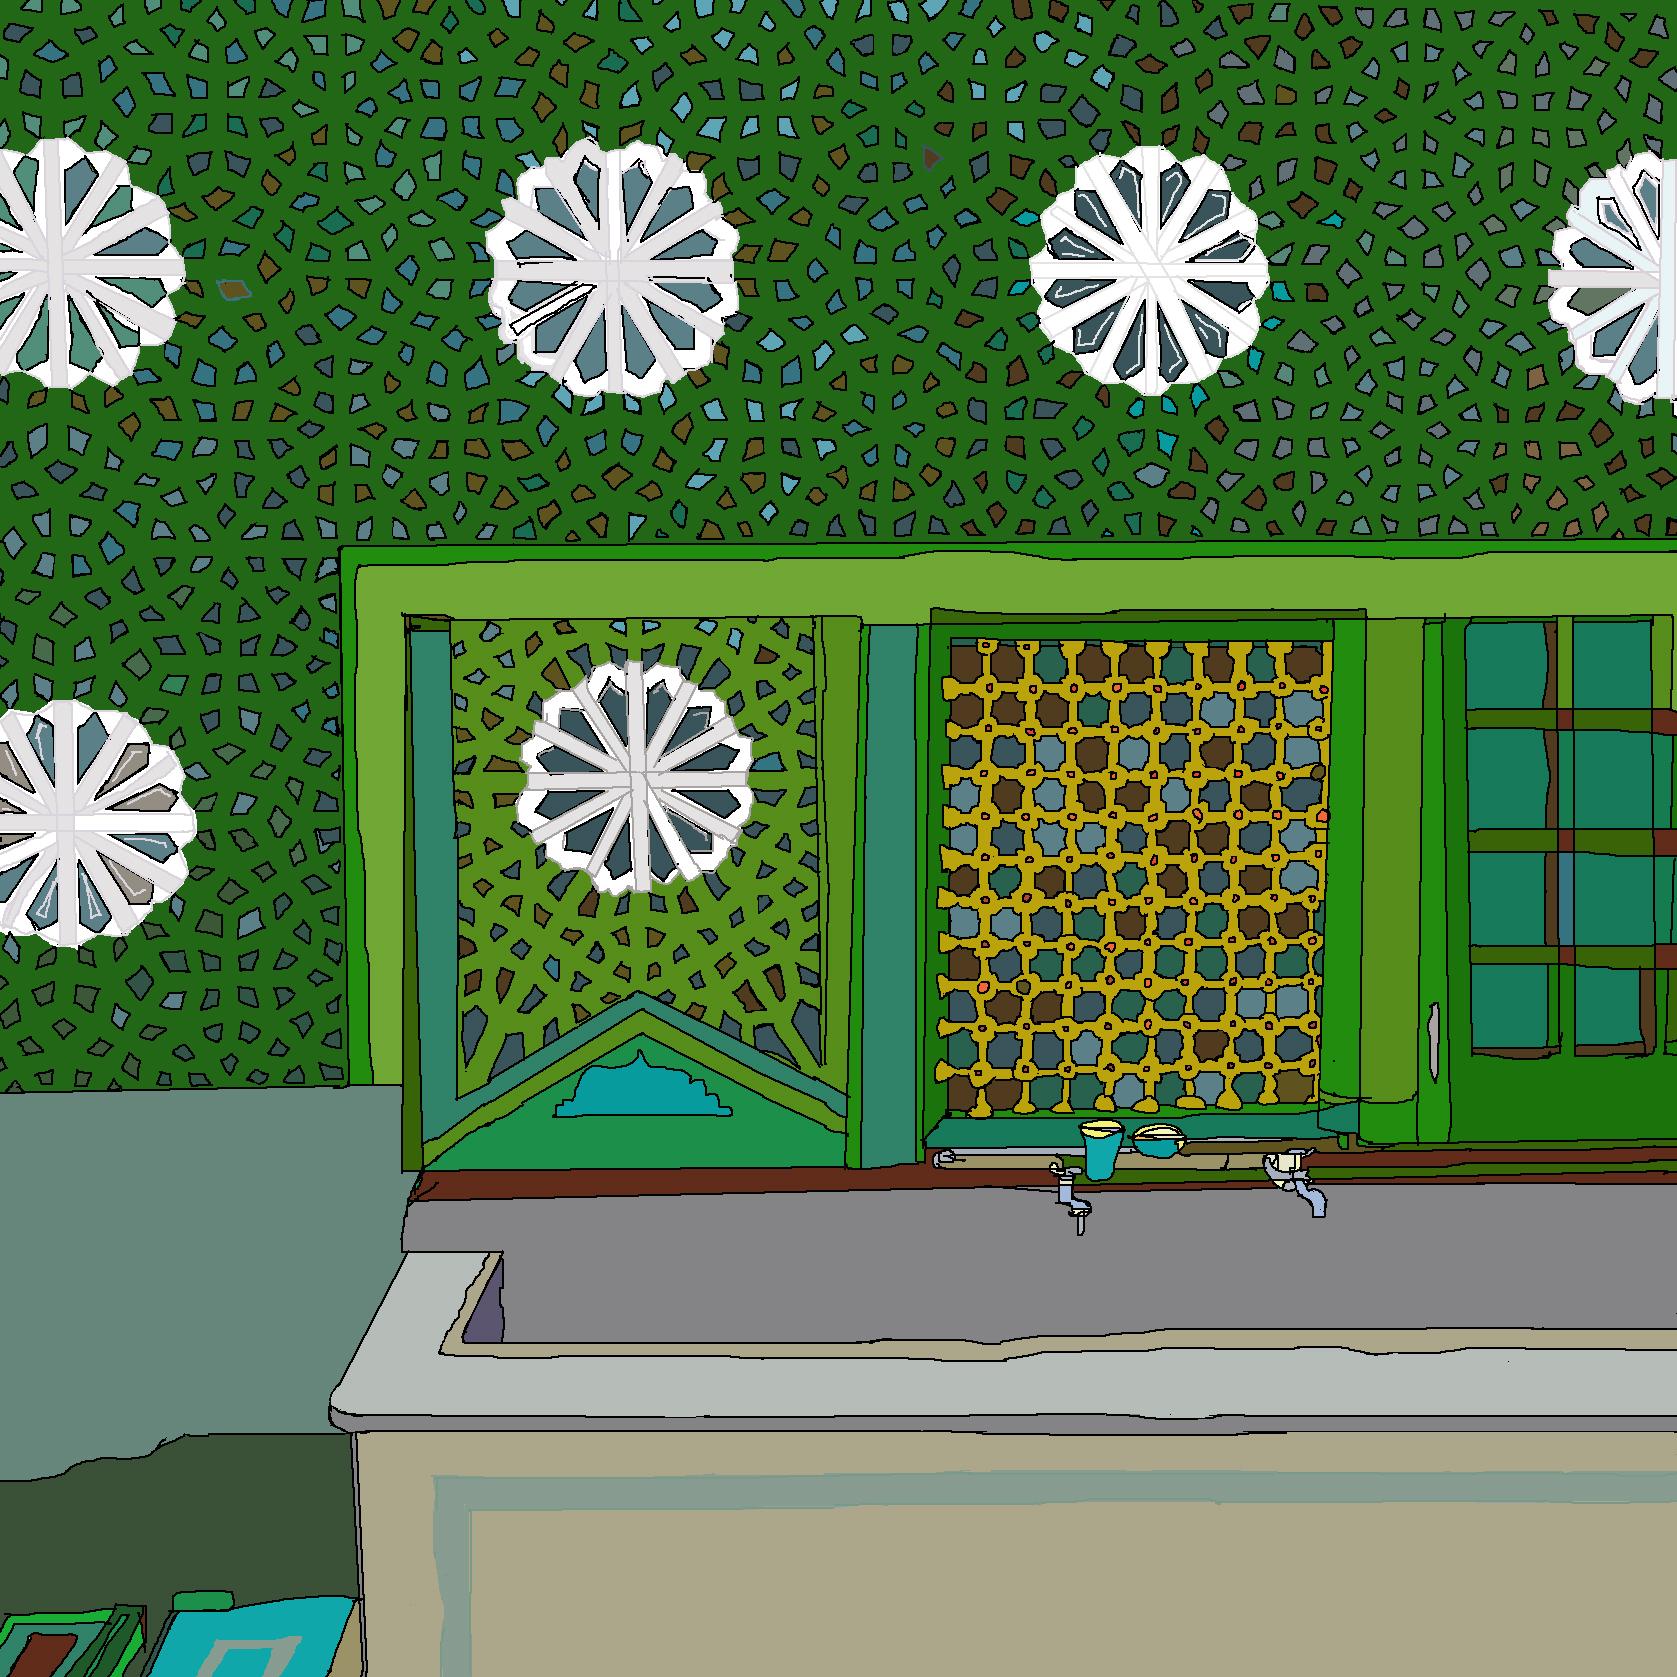 fontaine verte, iran